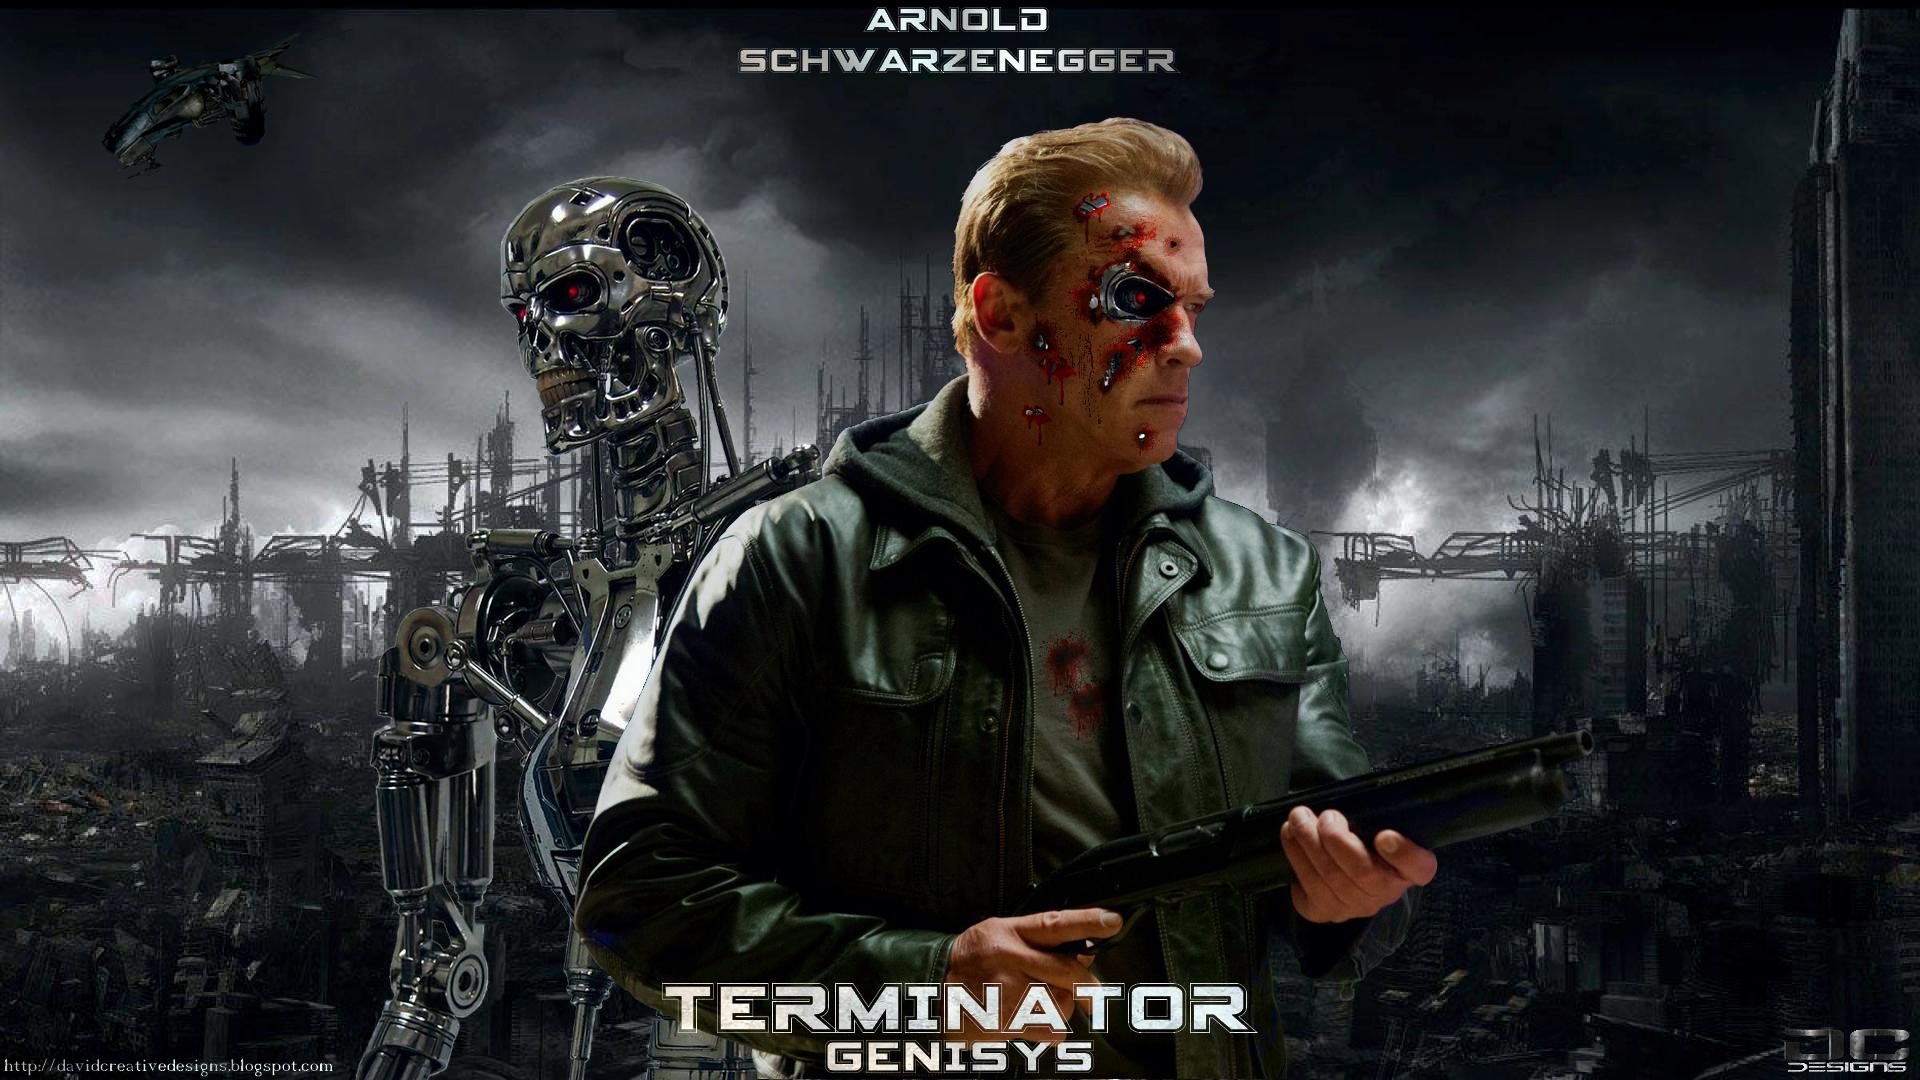 Terminator Genisys HD Wallpapers Backgrounds Wallpaper